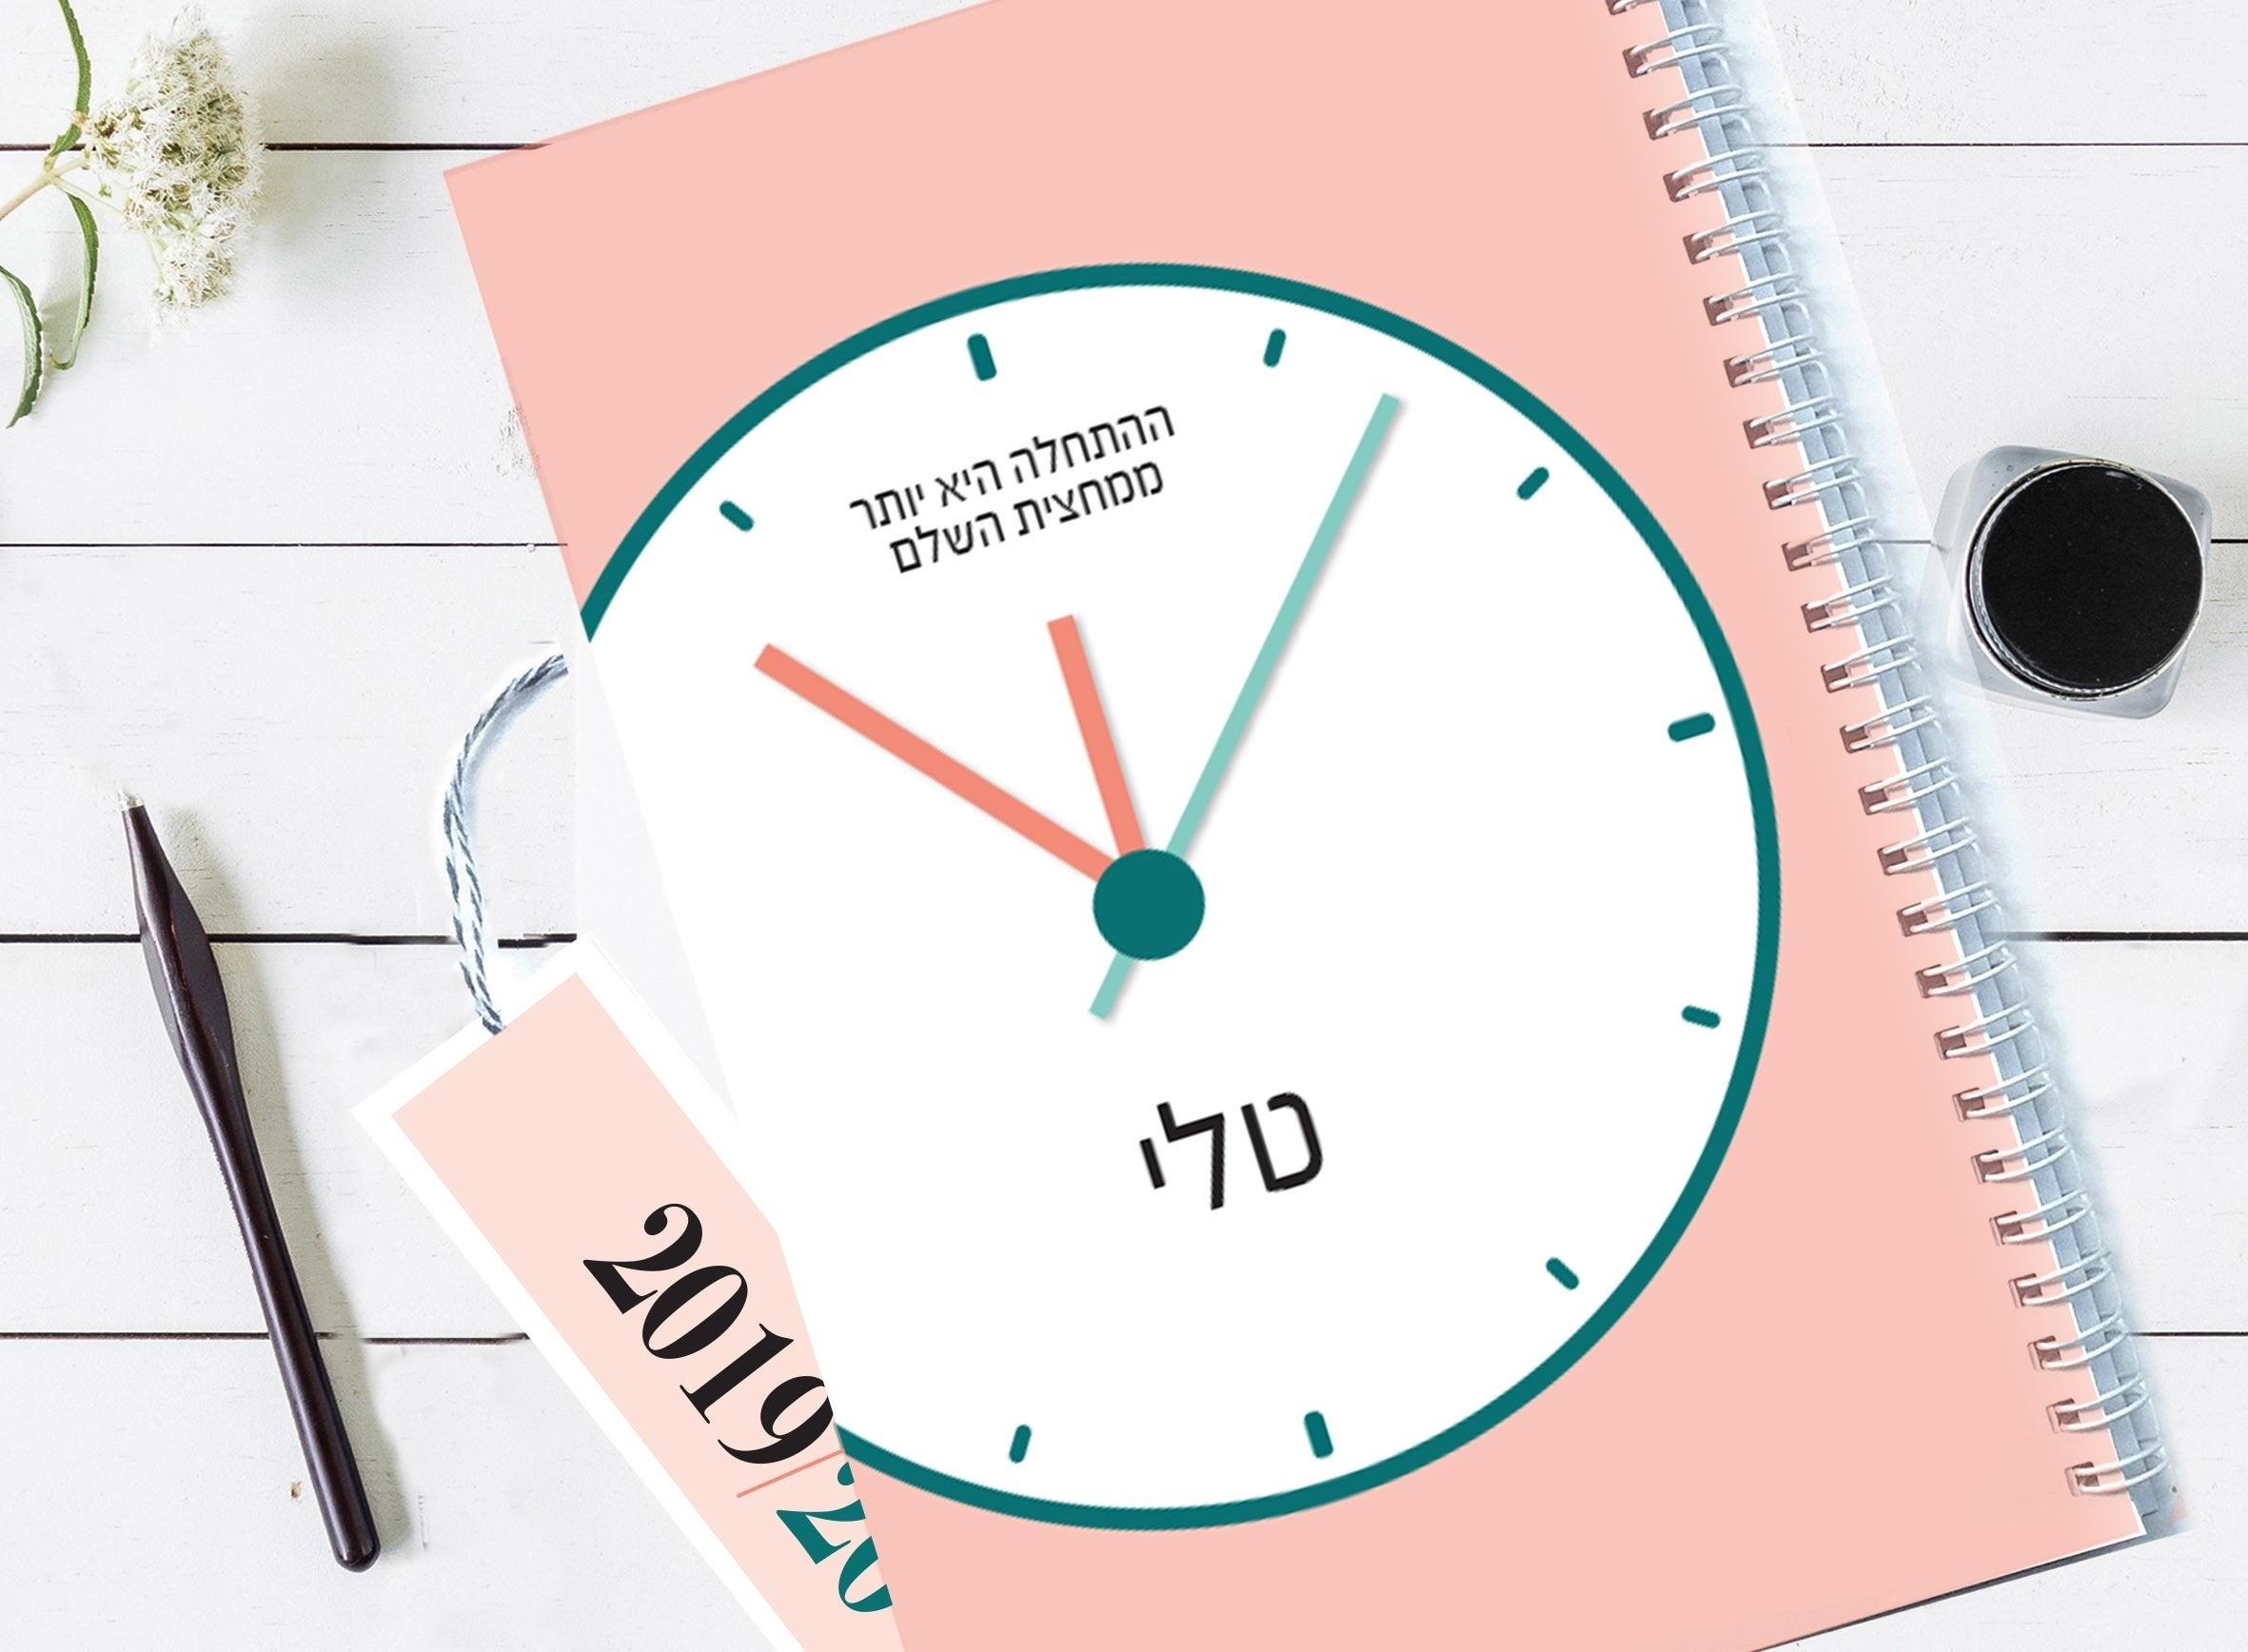 Personal Hebrew Weekly Calendar 2019-20 Creative Calendar   Etsy in 2019 - 2020 Weekly Torah Portion Calendar